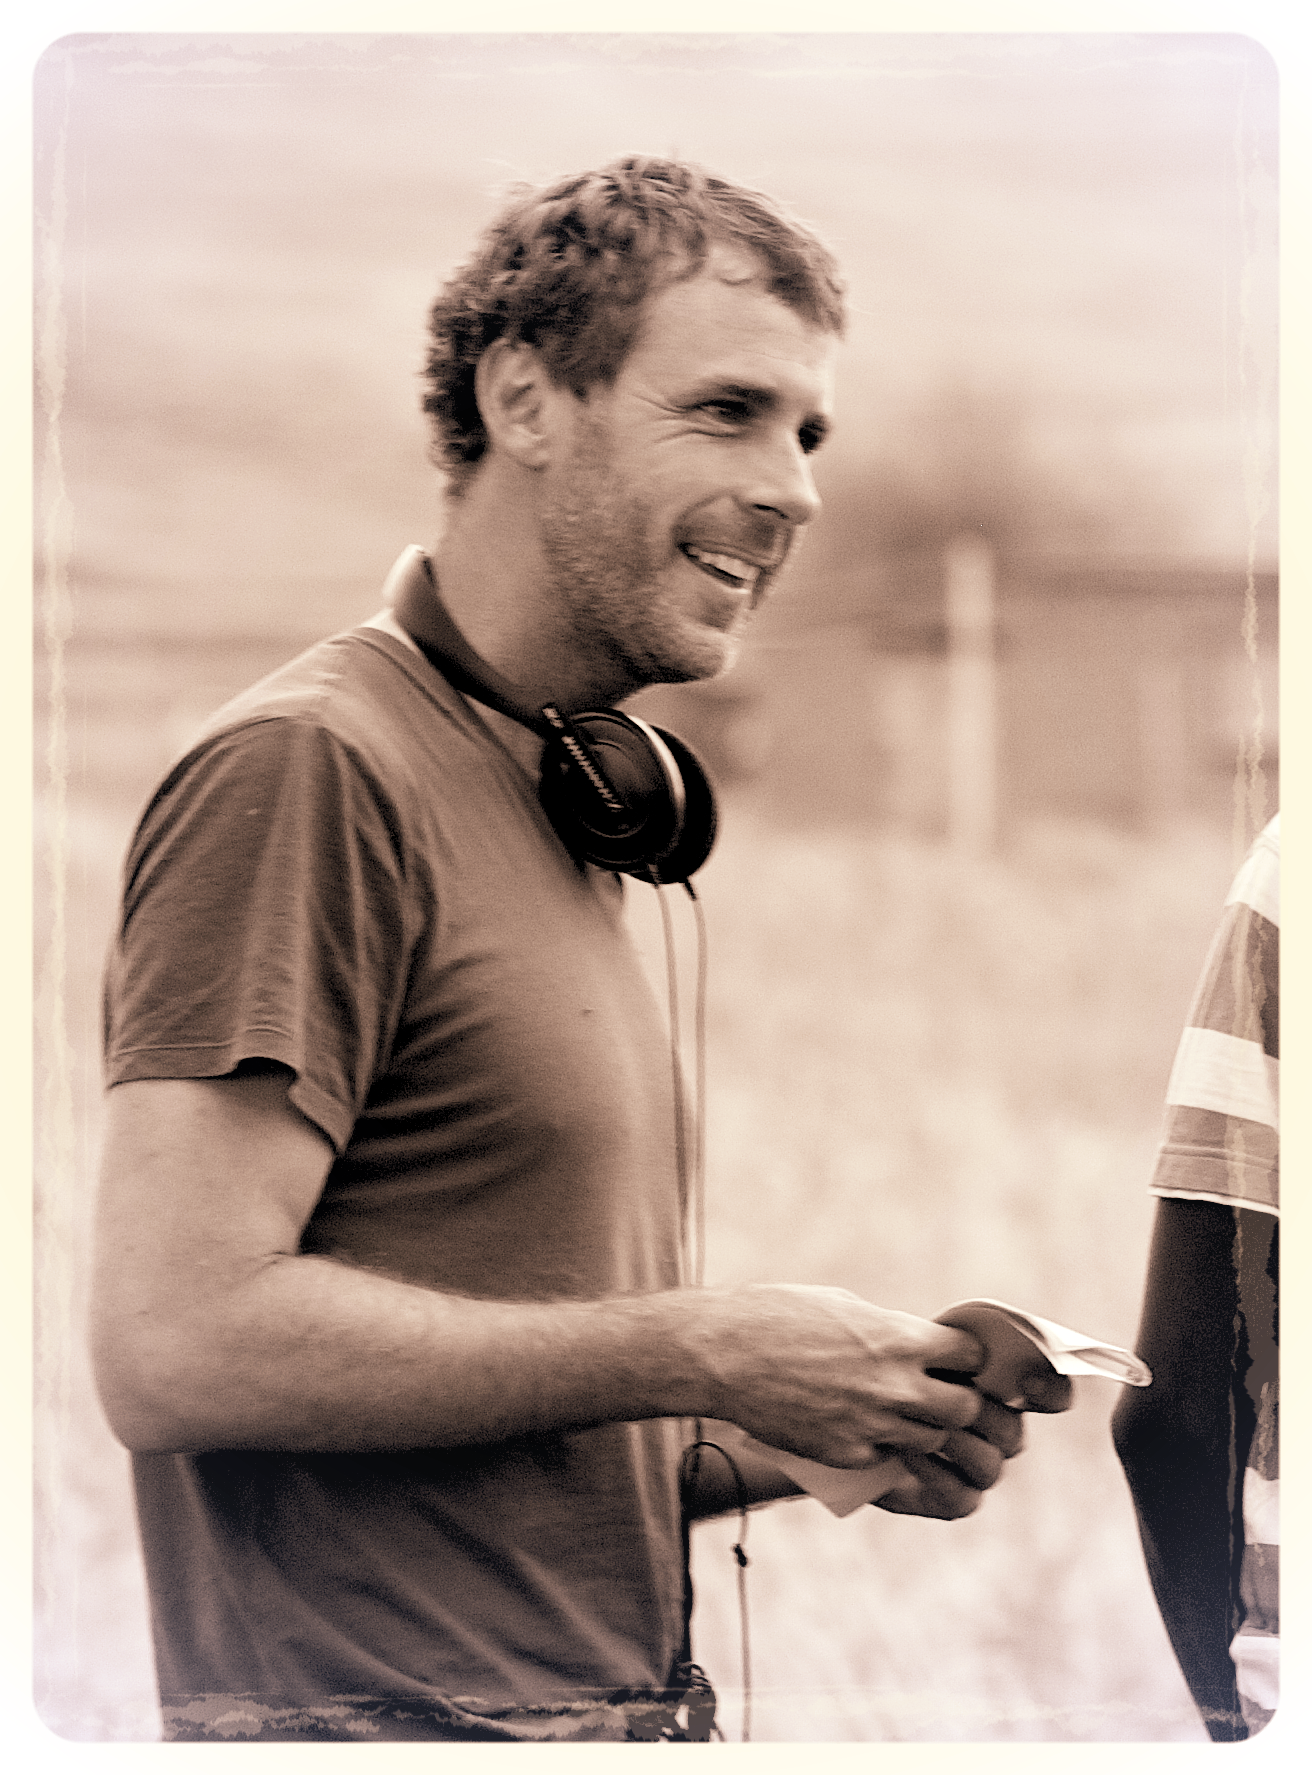 Writer/Director Andrew Mudge